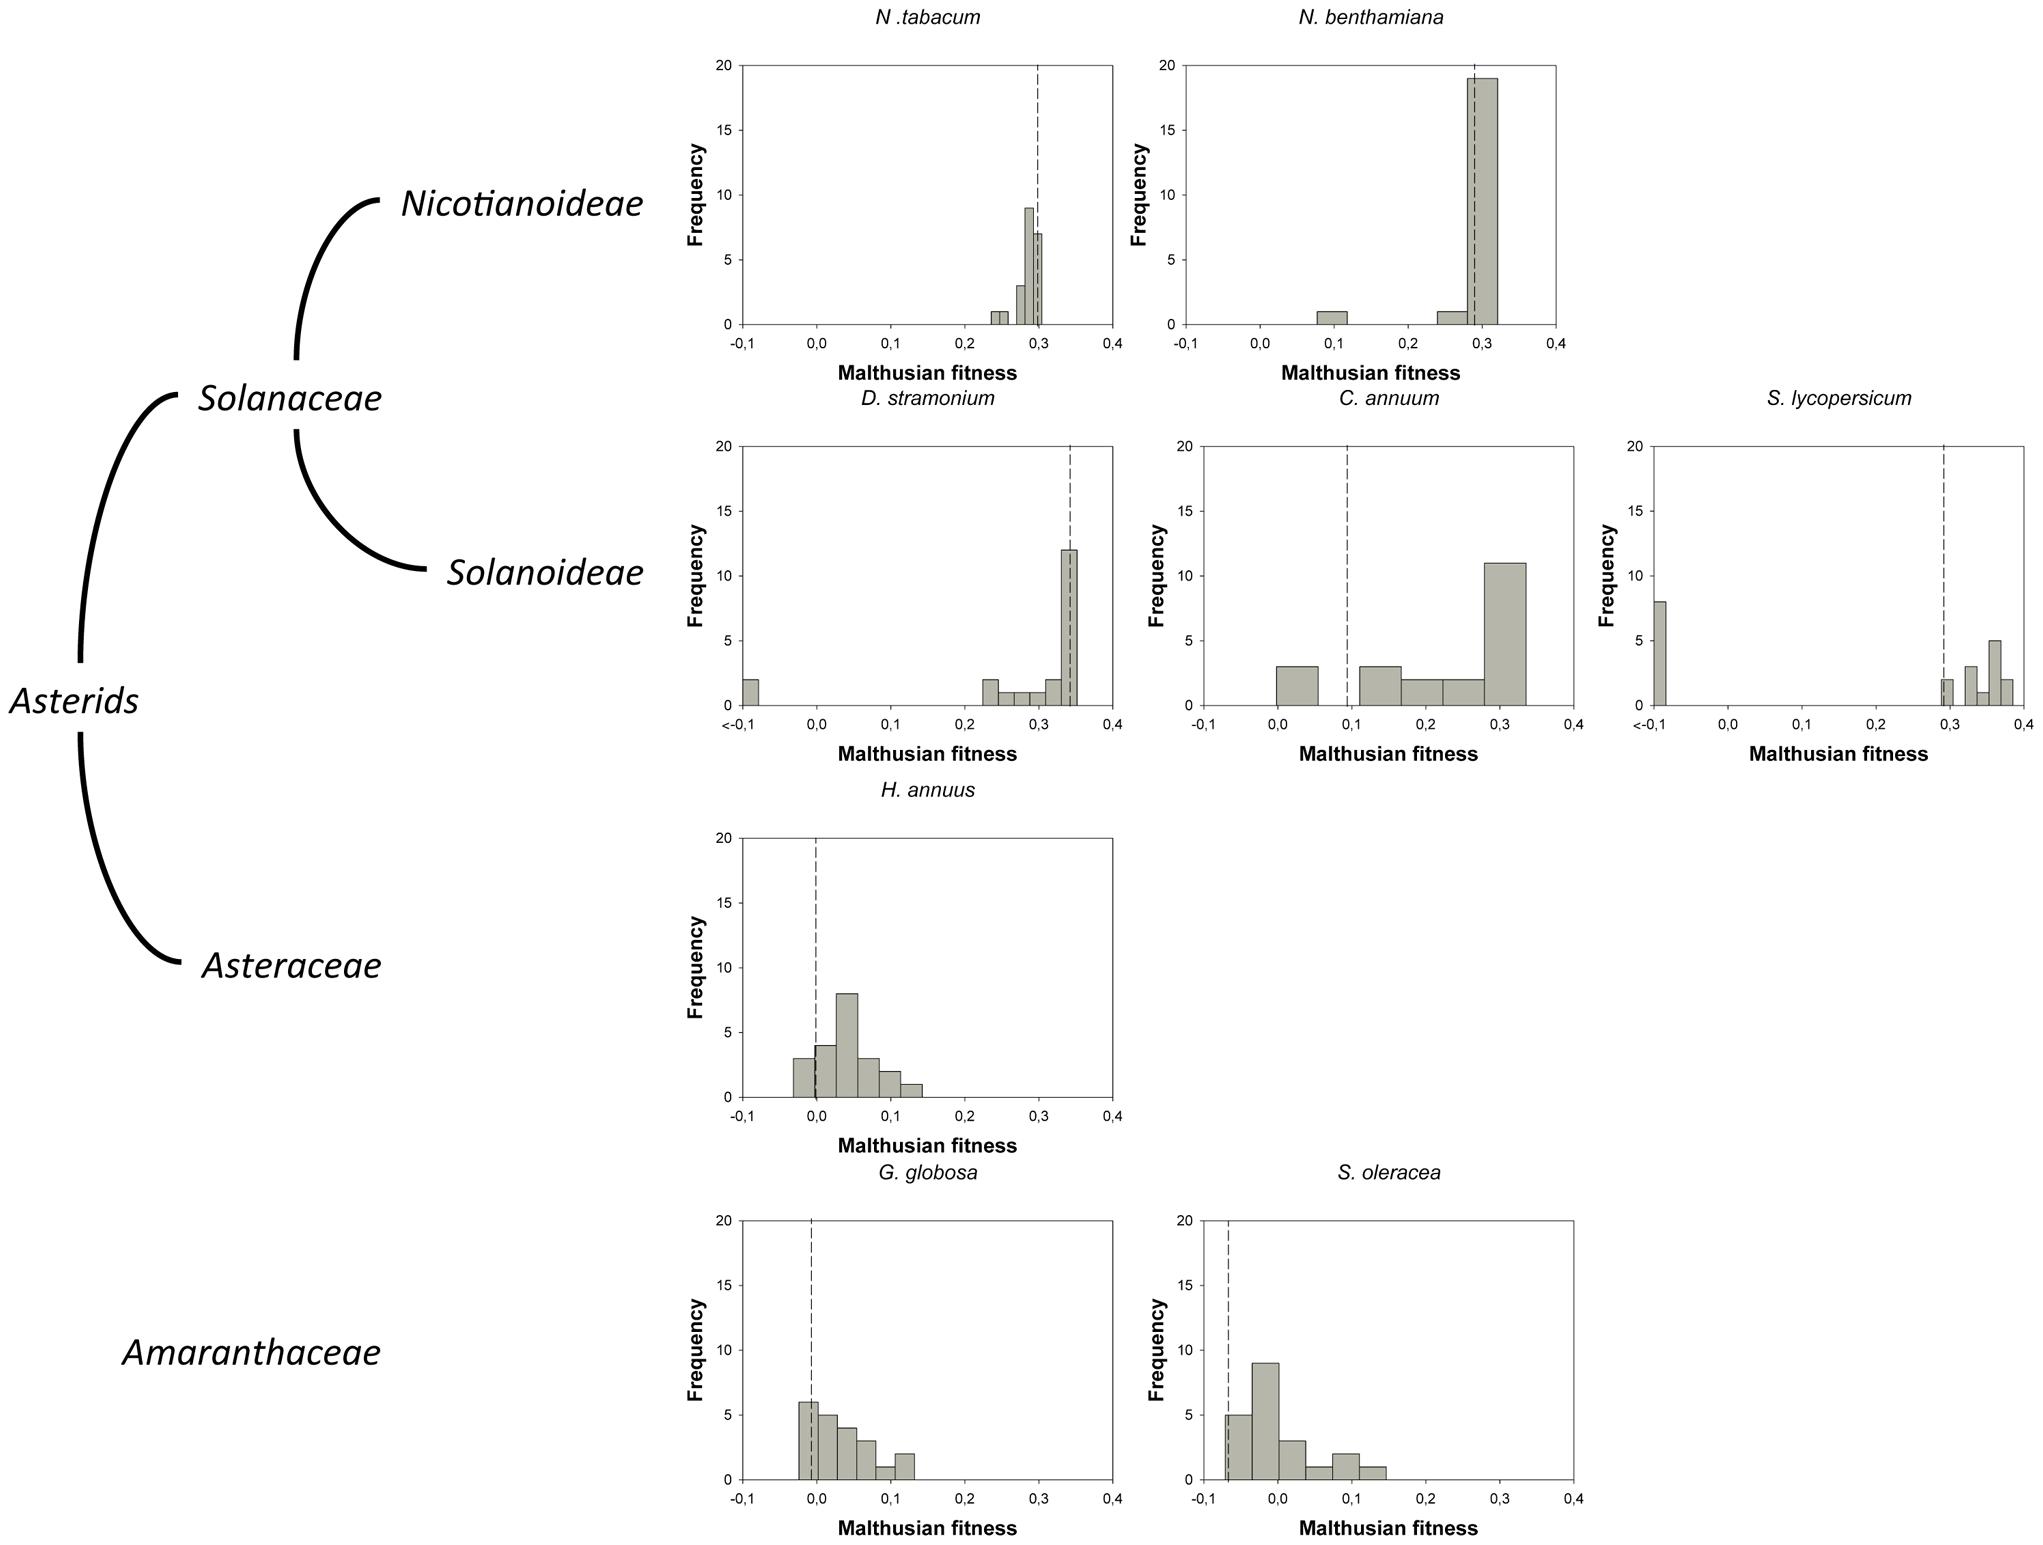 DMFEs across different host species.